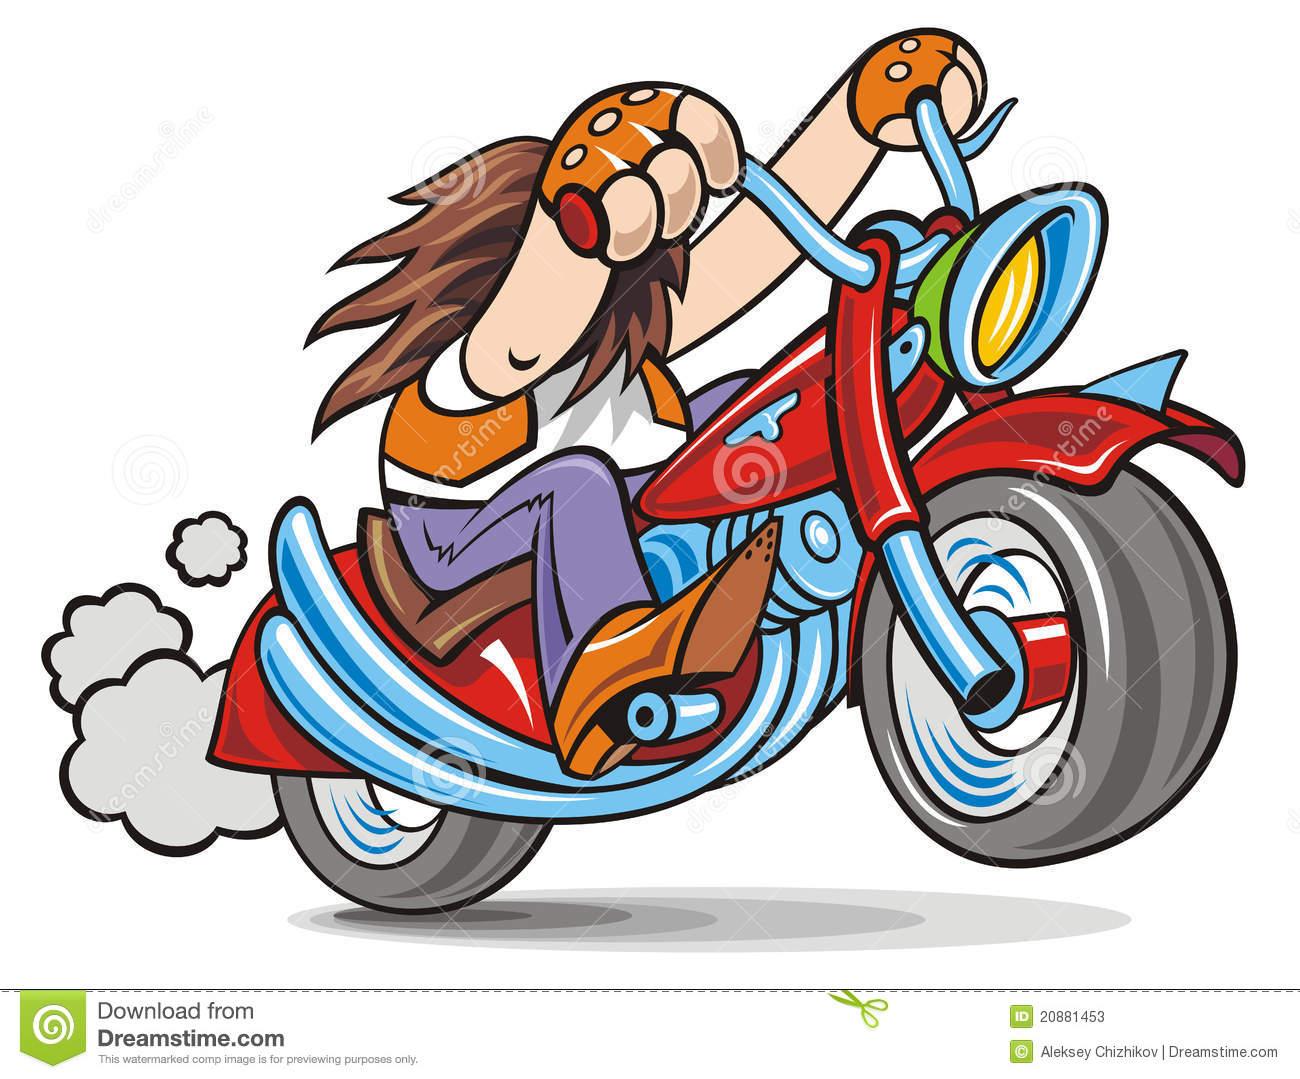 Collection of Biker clipart   Free download best Biker clipart on ... png transparent